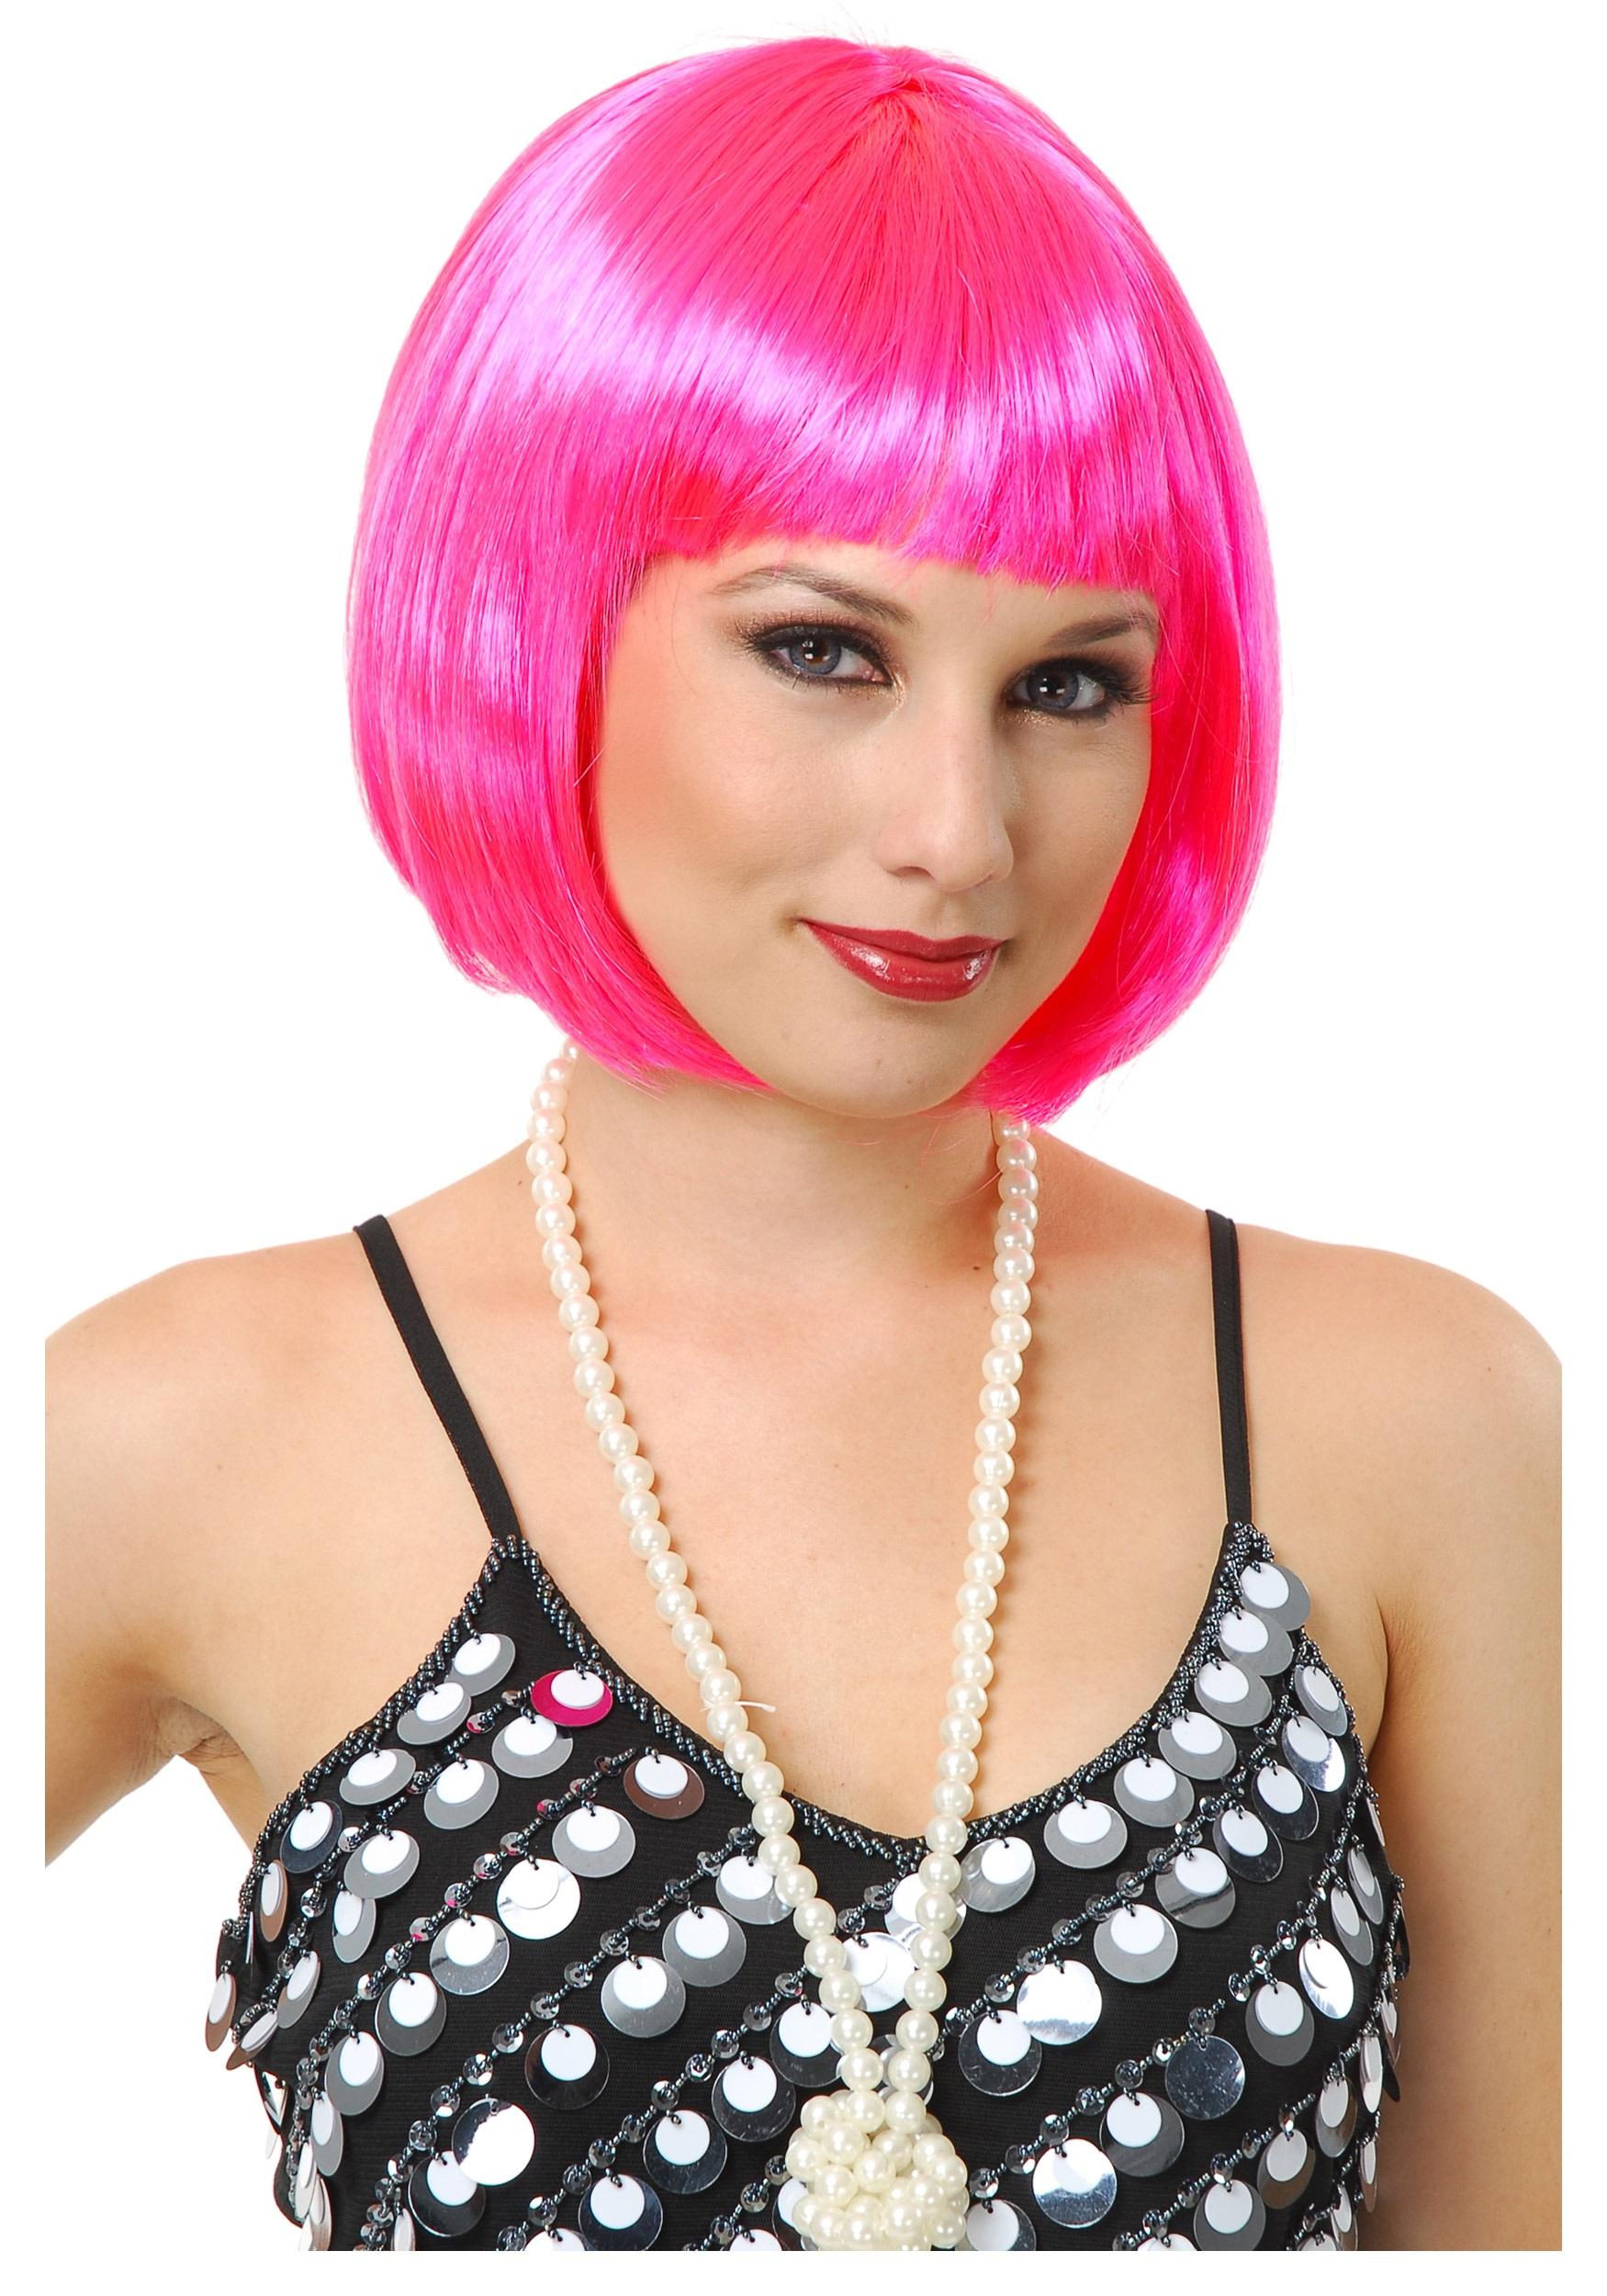 Gay Pride Halloween Costume.Short Bob Hot Pink Wig